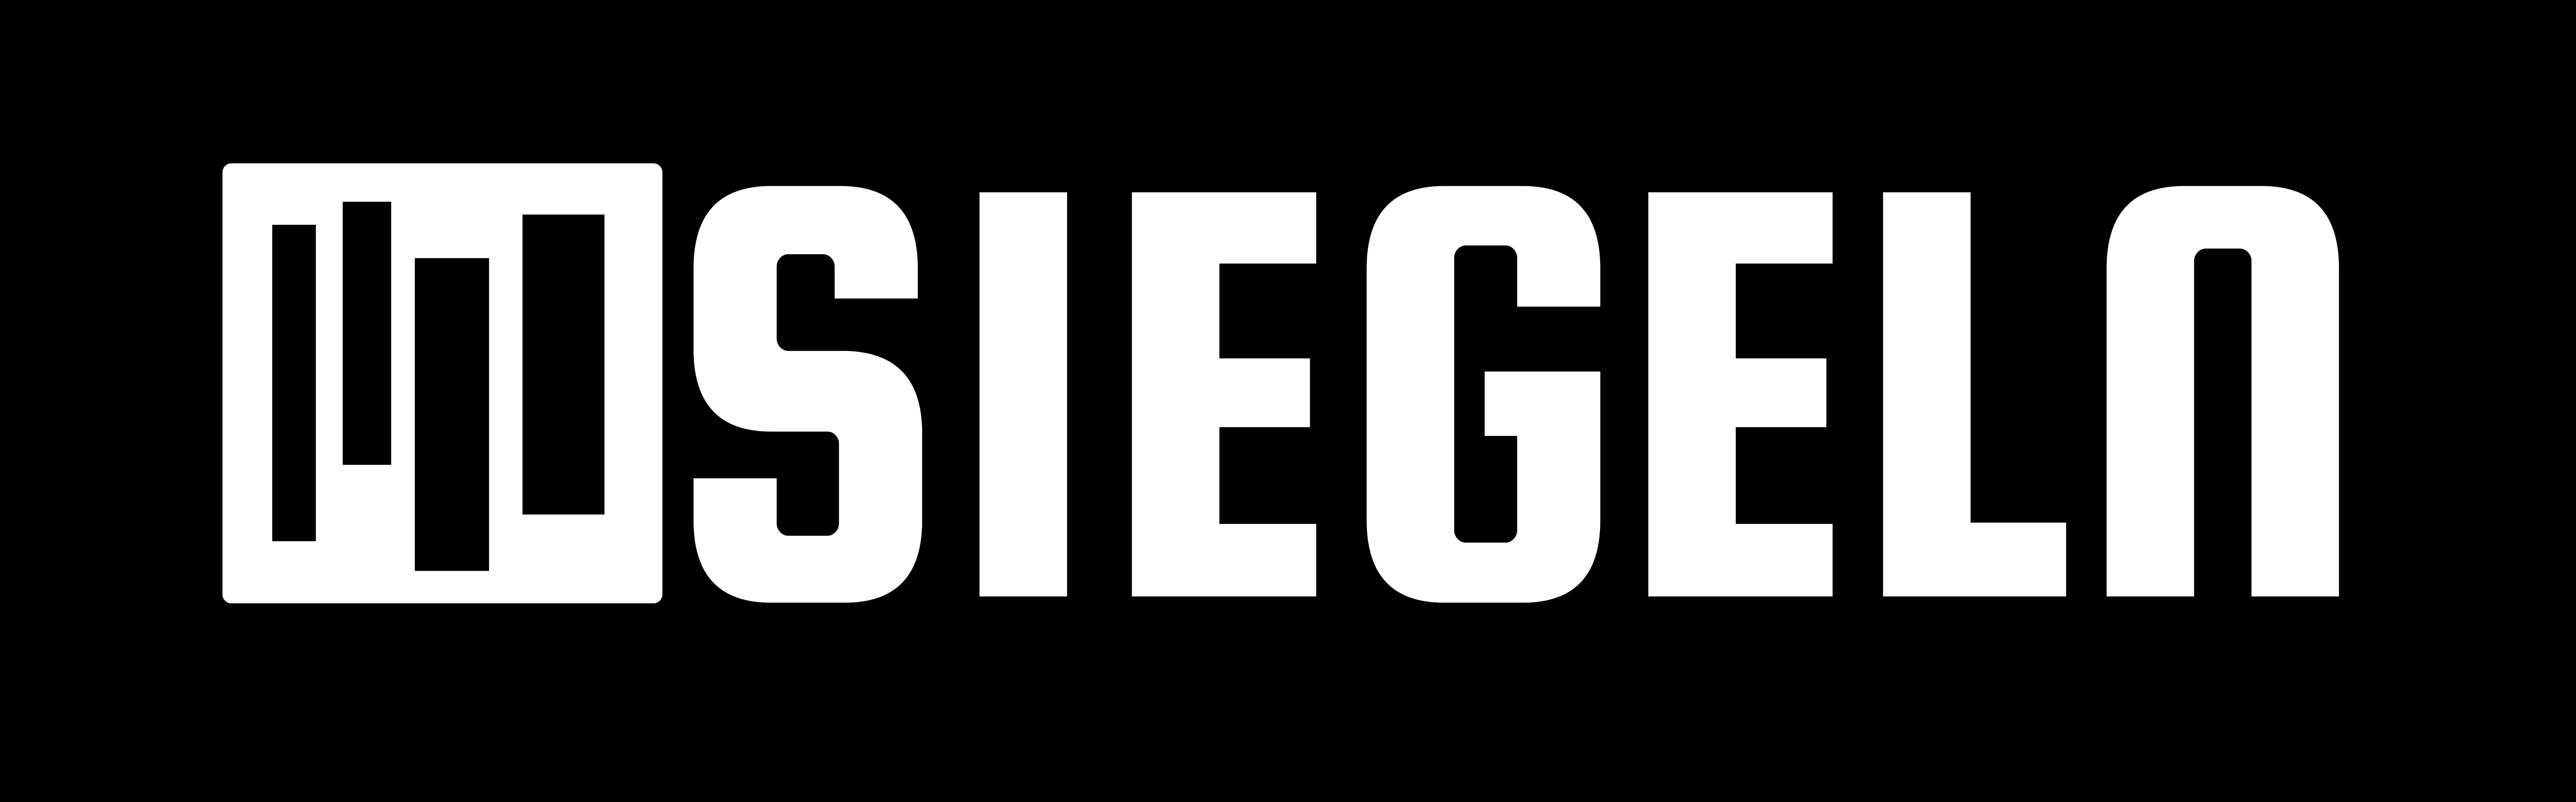 Internet prodaja Siegeln